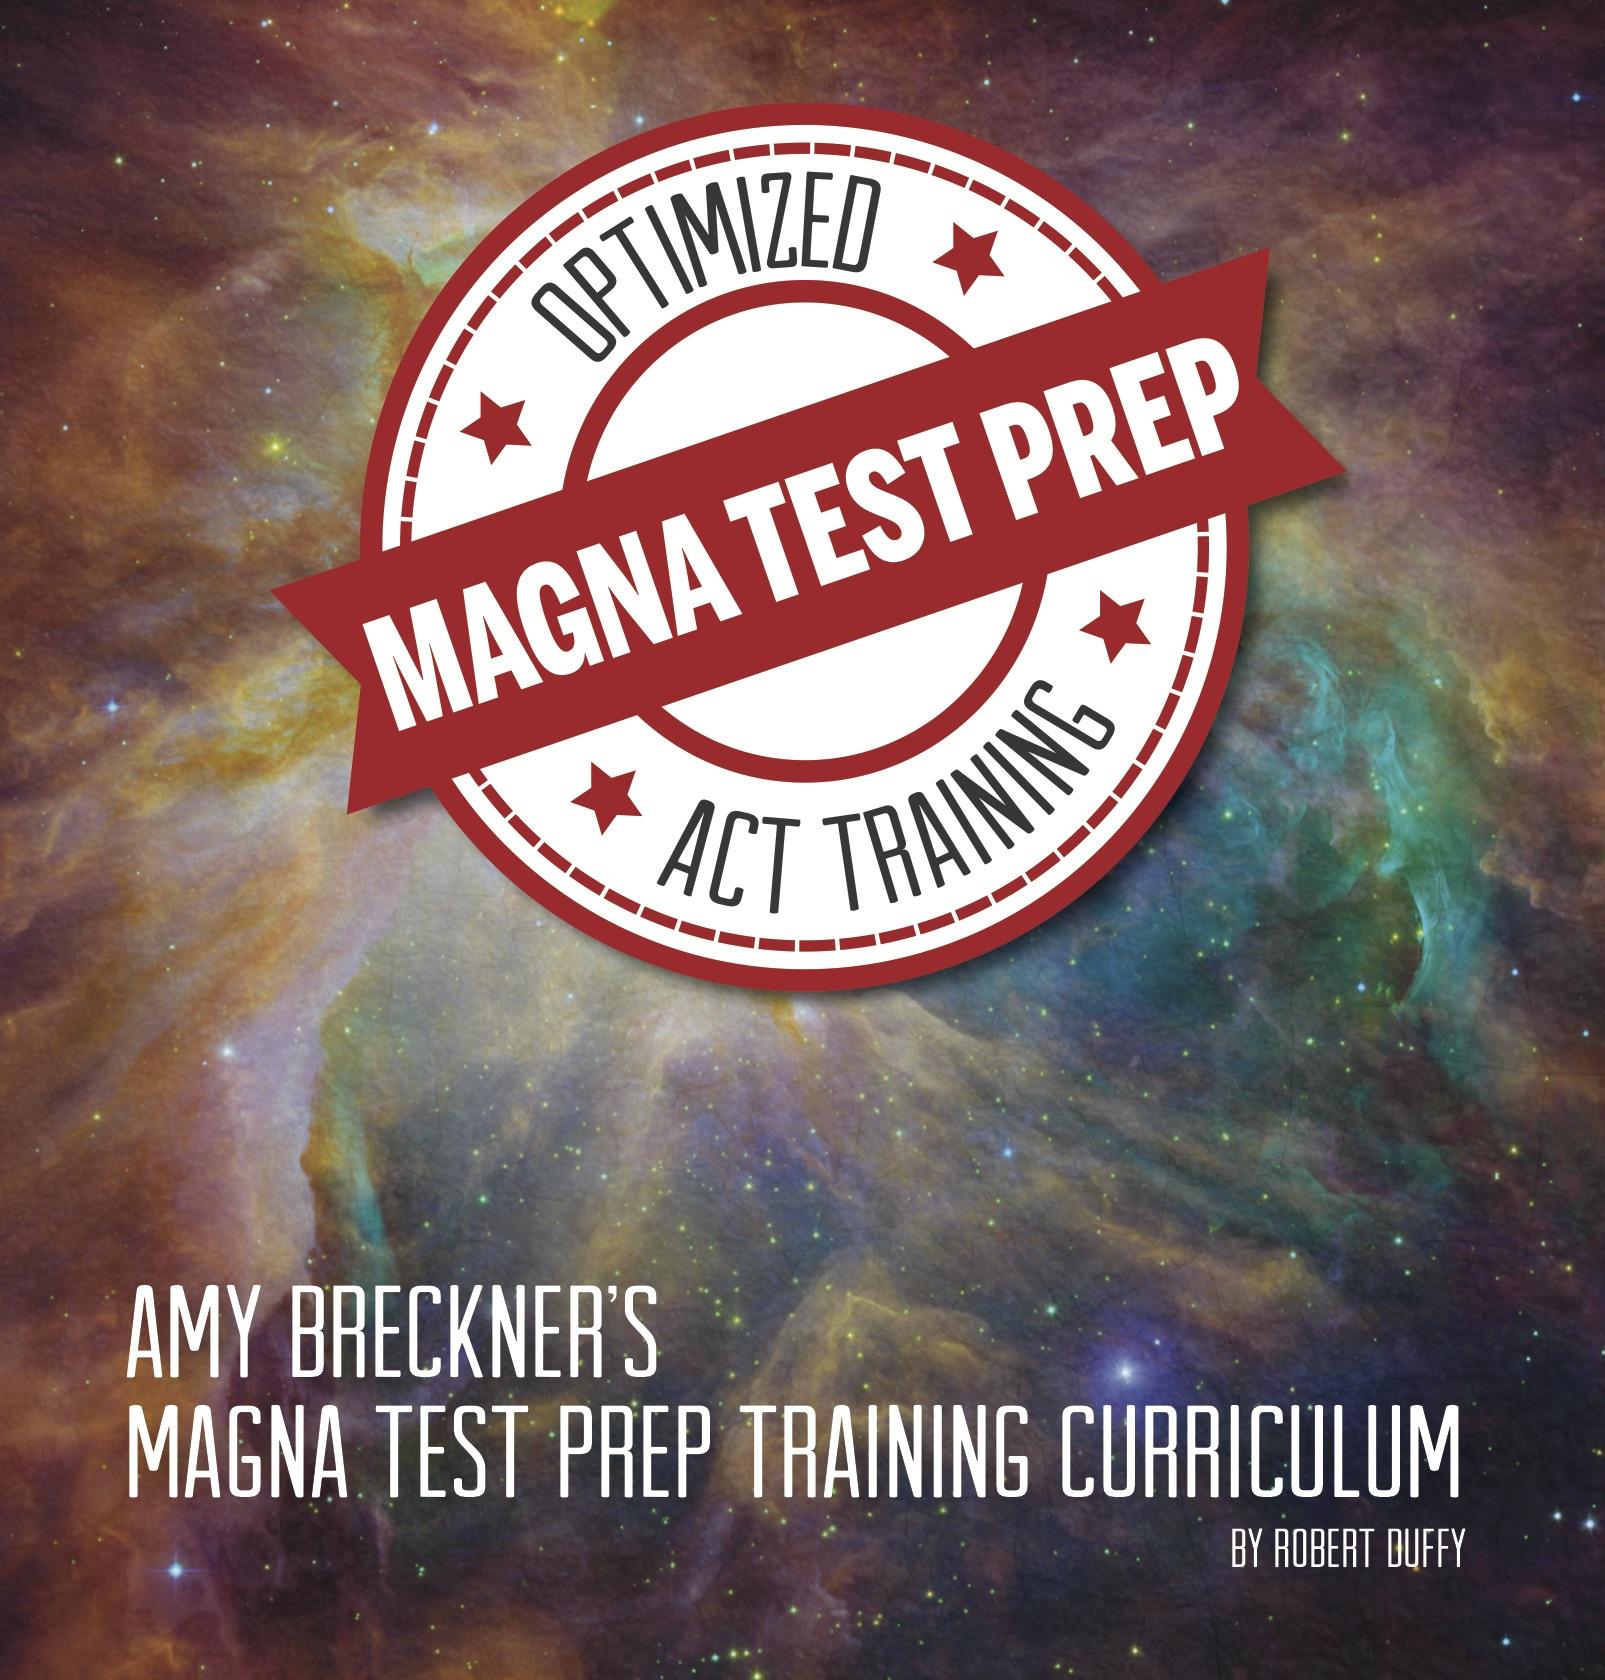 8-Magna Test Prep Cover Resized_4_1_16 copy.jpg